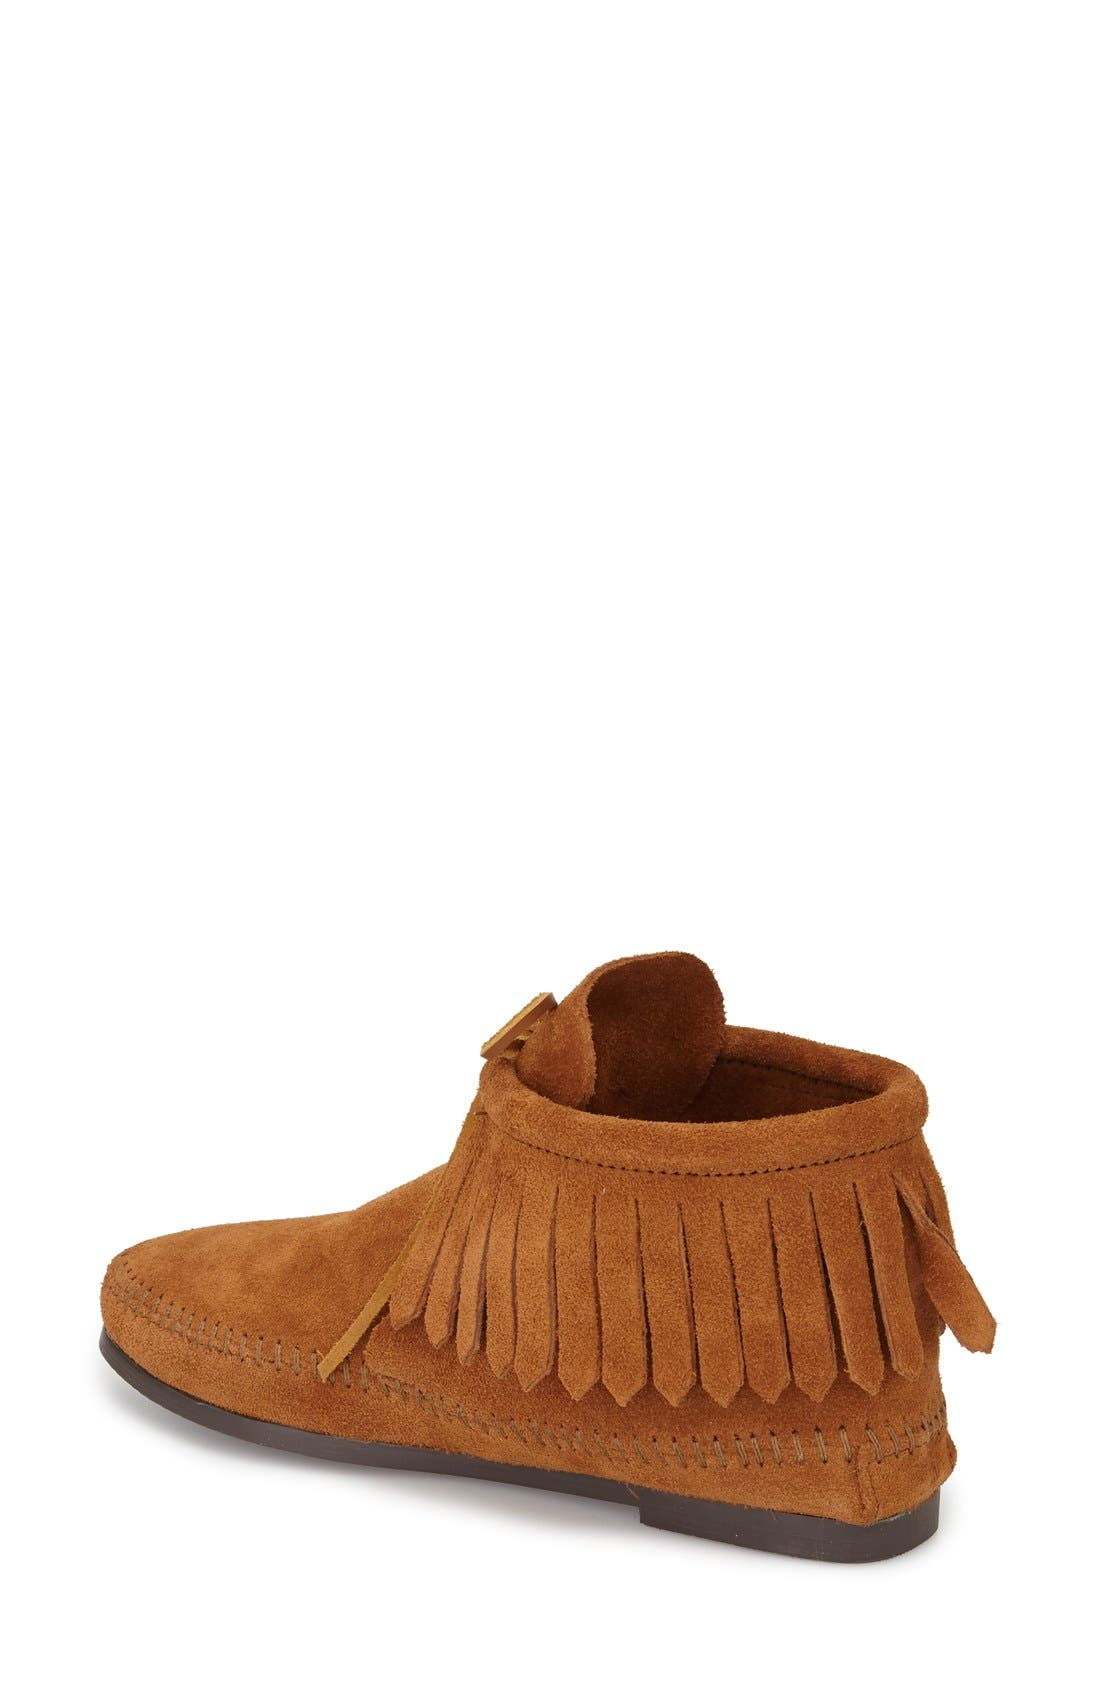 Alternate Image 2  - Minnetonka Classic Fringed Chukka Style Boot (Women)